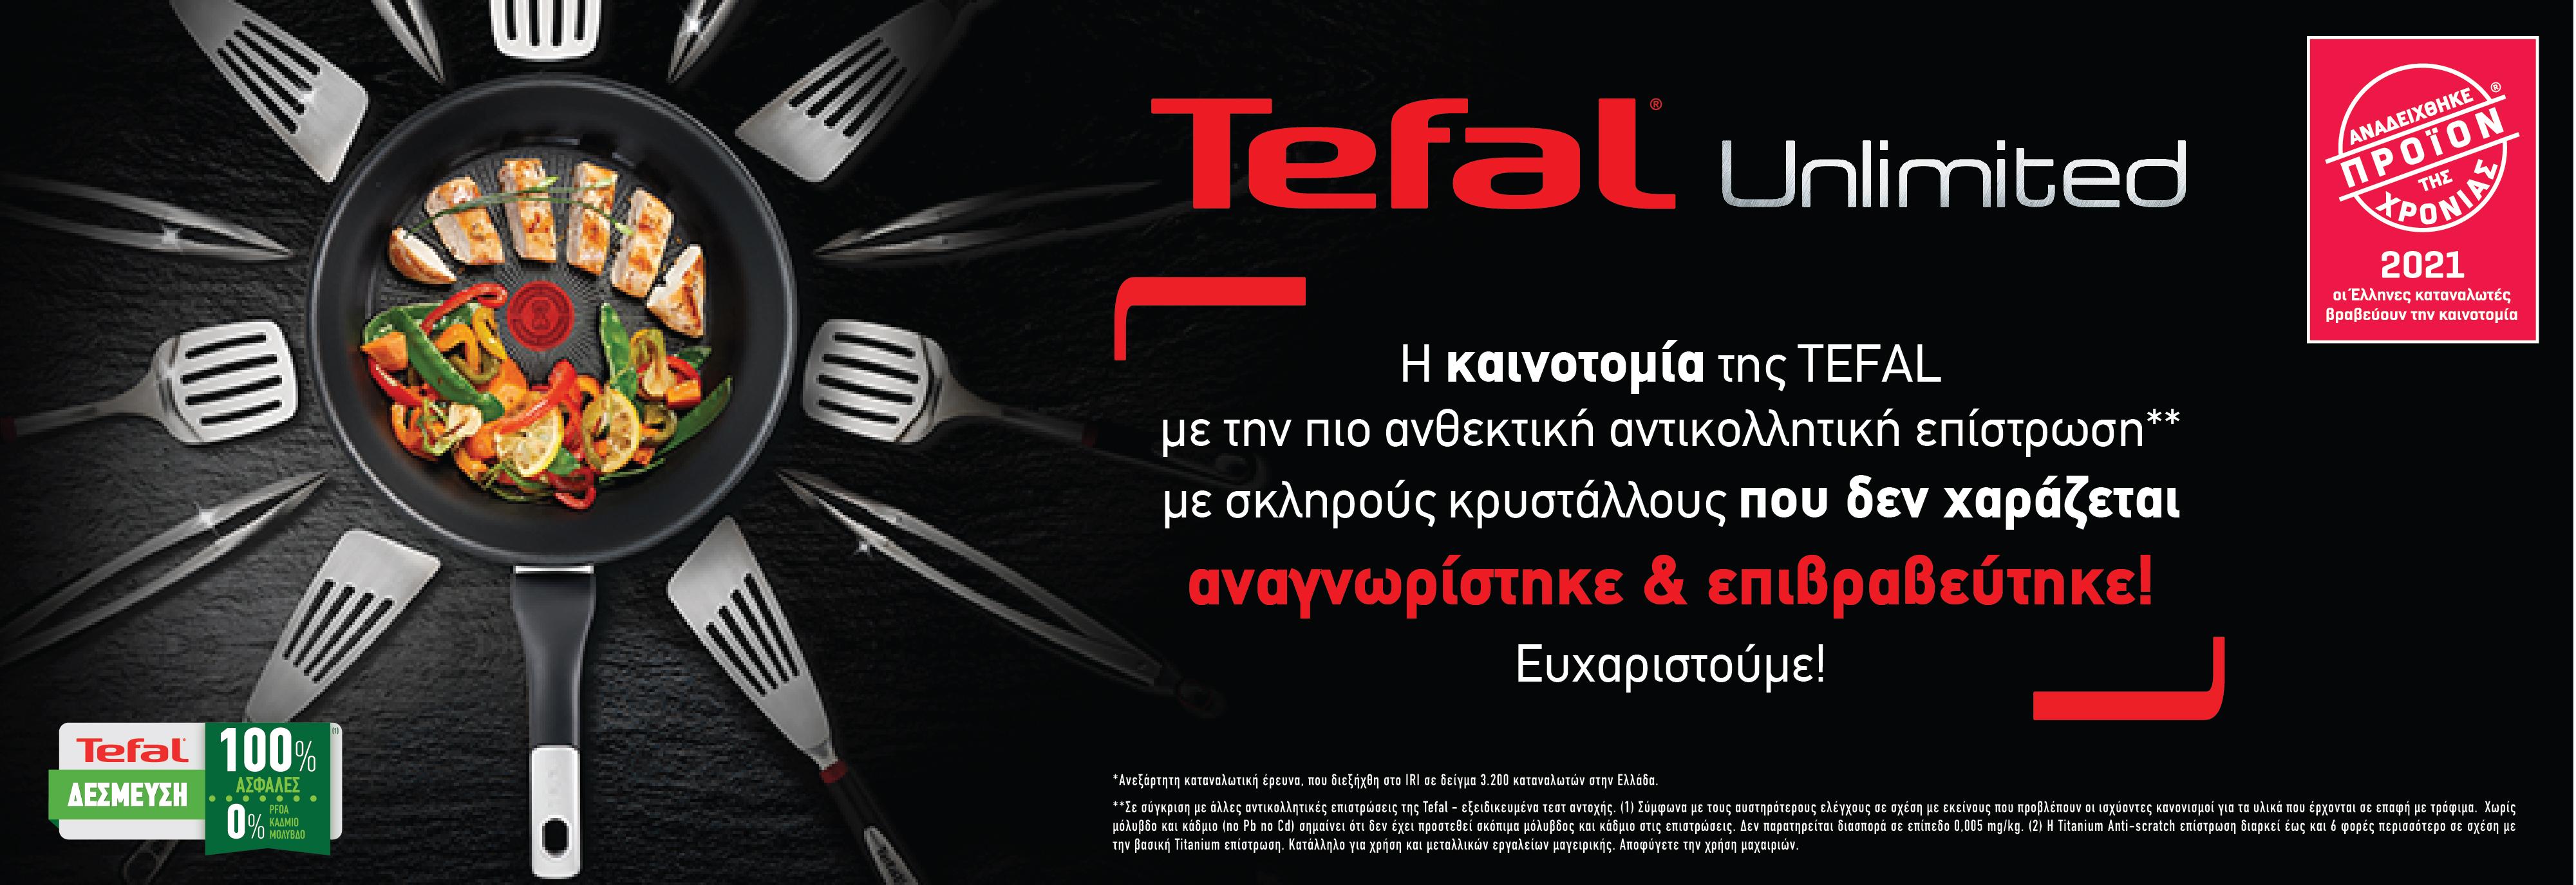 Tefal Unlimited ktx POY Web Banner 960x330pix FEB 2021 thank you.jpg